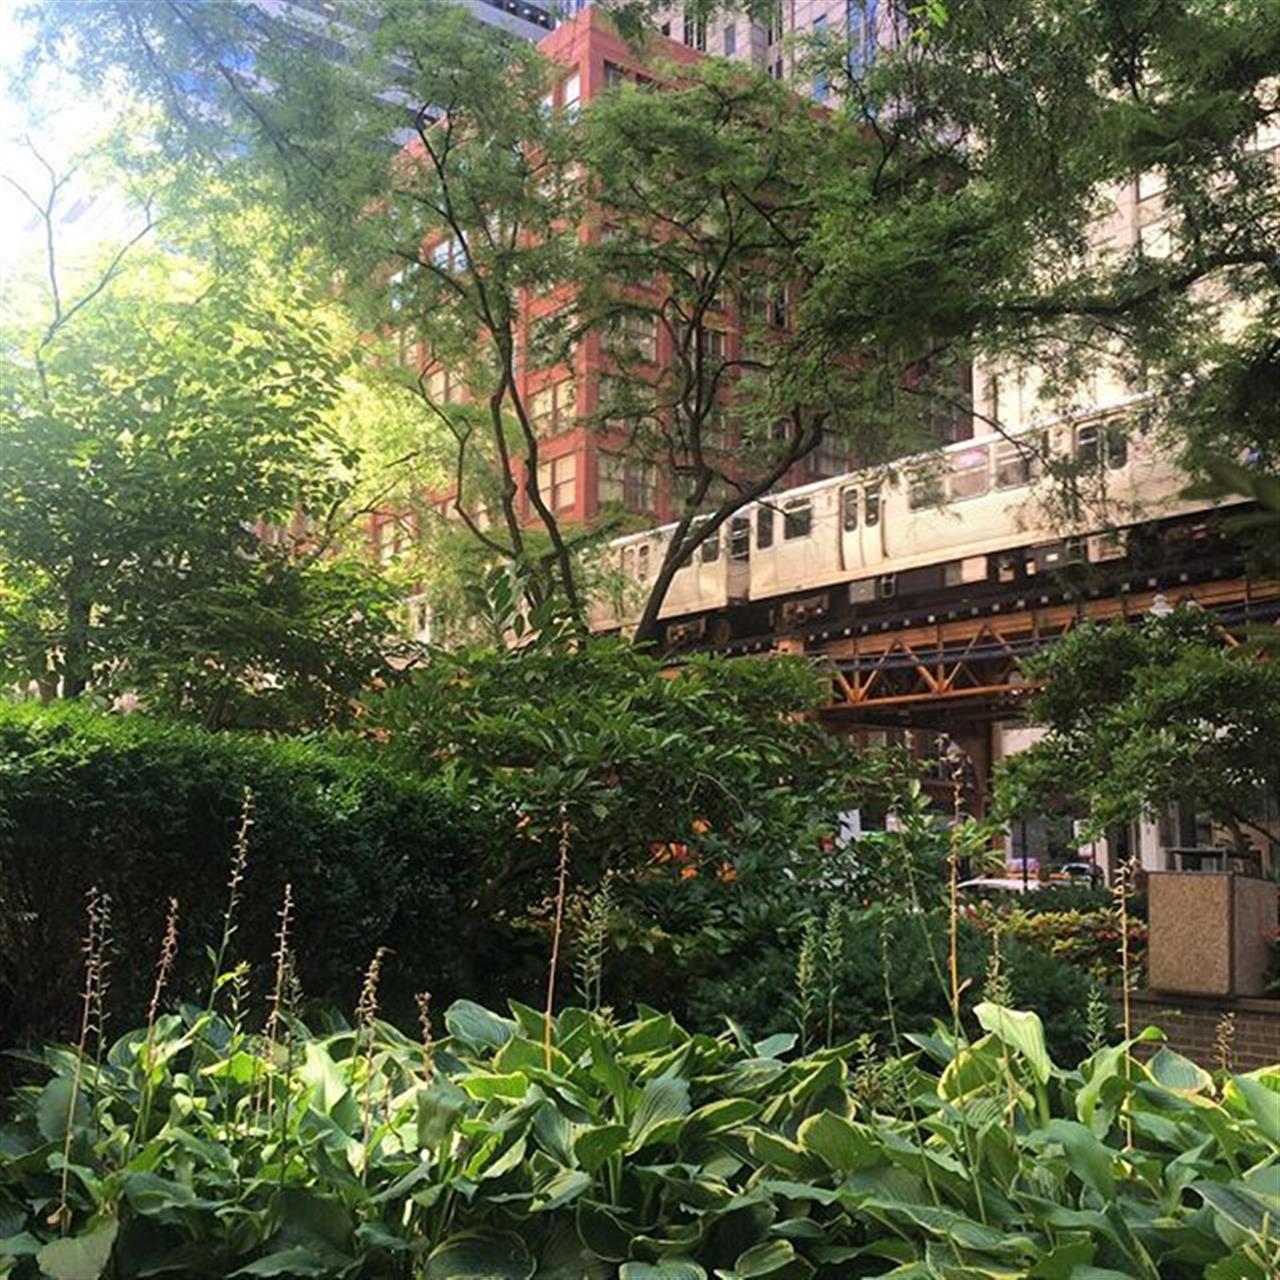 Lunch in the Chicago Loop.  Hidden garden with an EL track cut through!